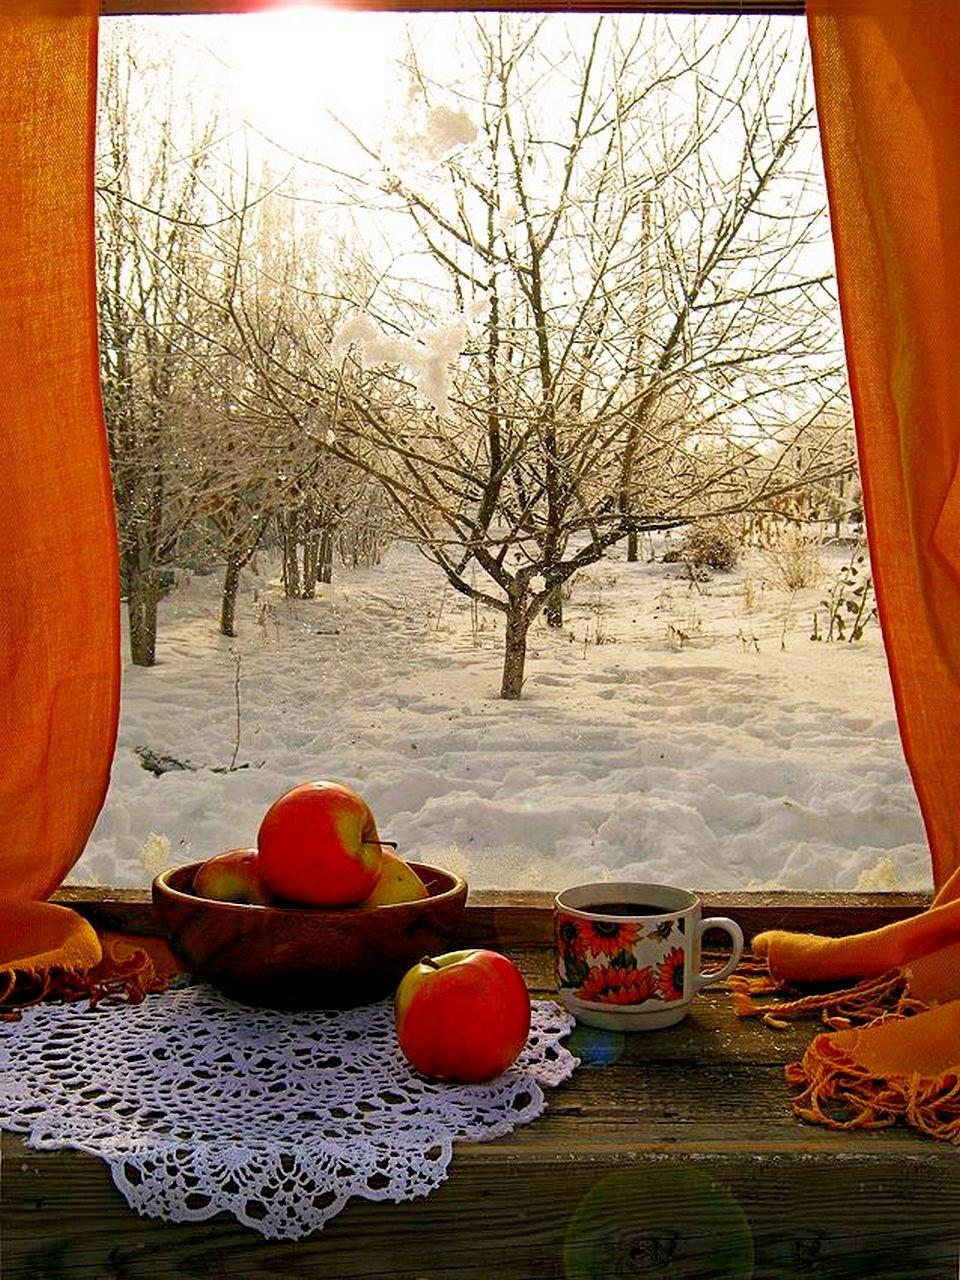 Марта, открытка доброго зимнего утра орхидеи на окне за окном зима снег